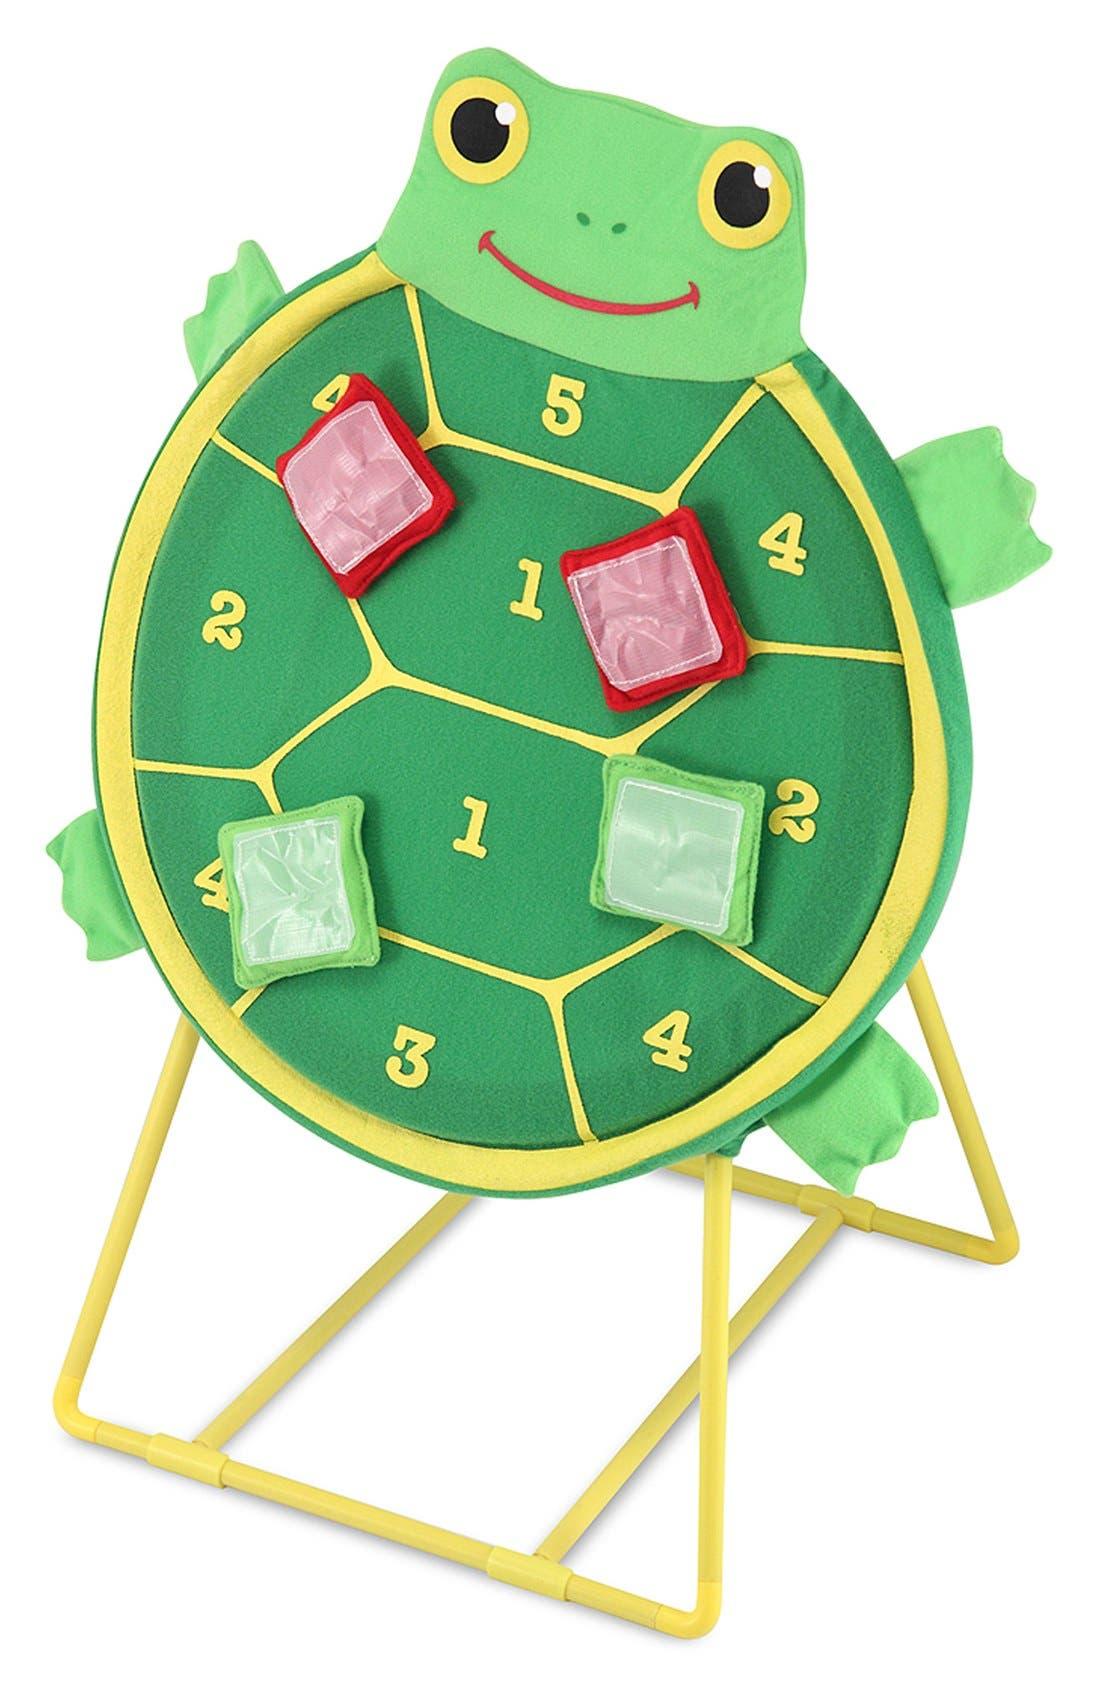 Melissa & Doug 'Tootle Turtle' Target Game